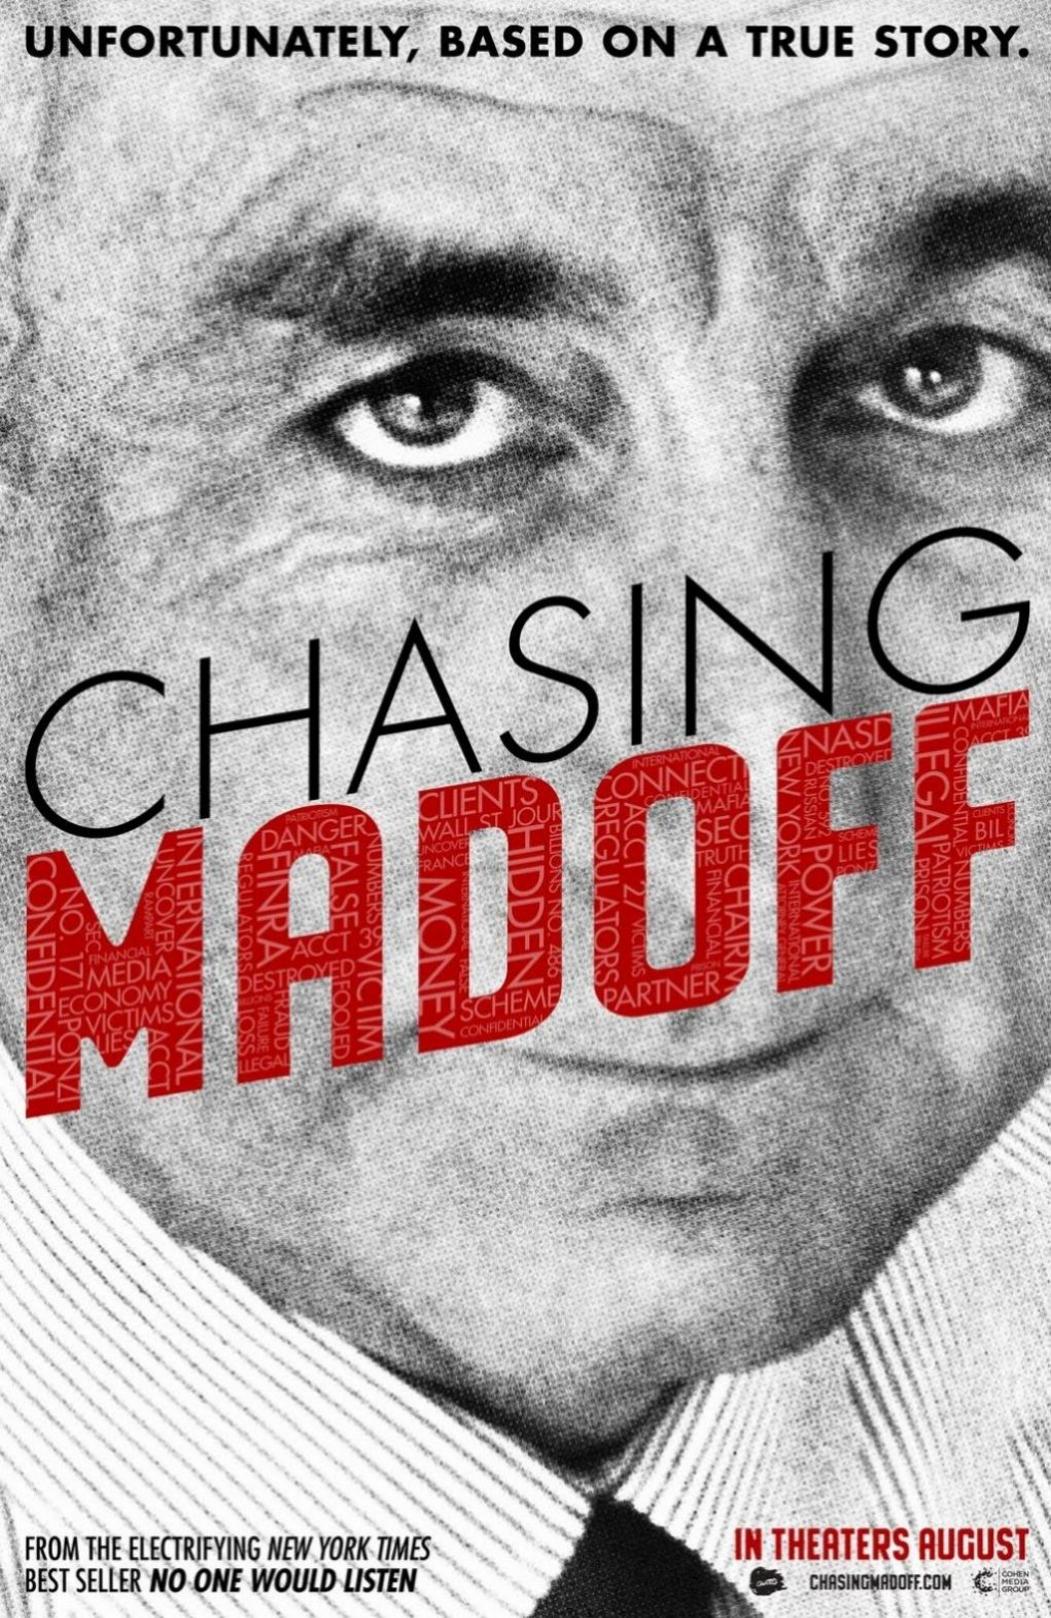 Chasing Madoff - Movie Poster #2 (Original)